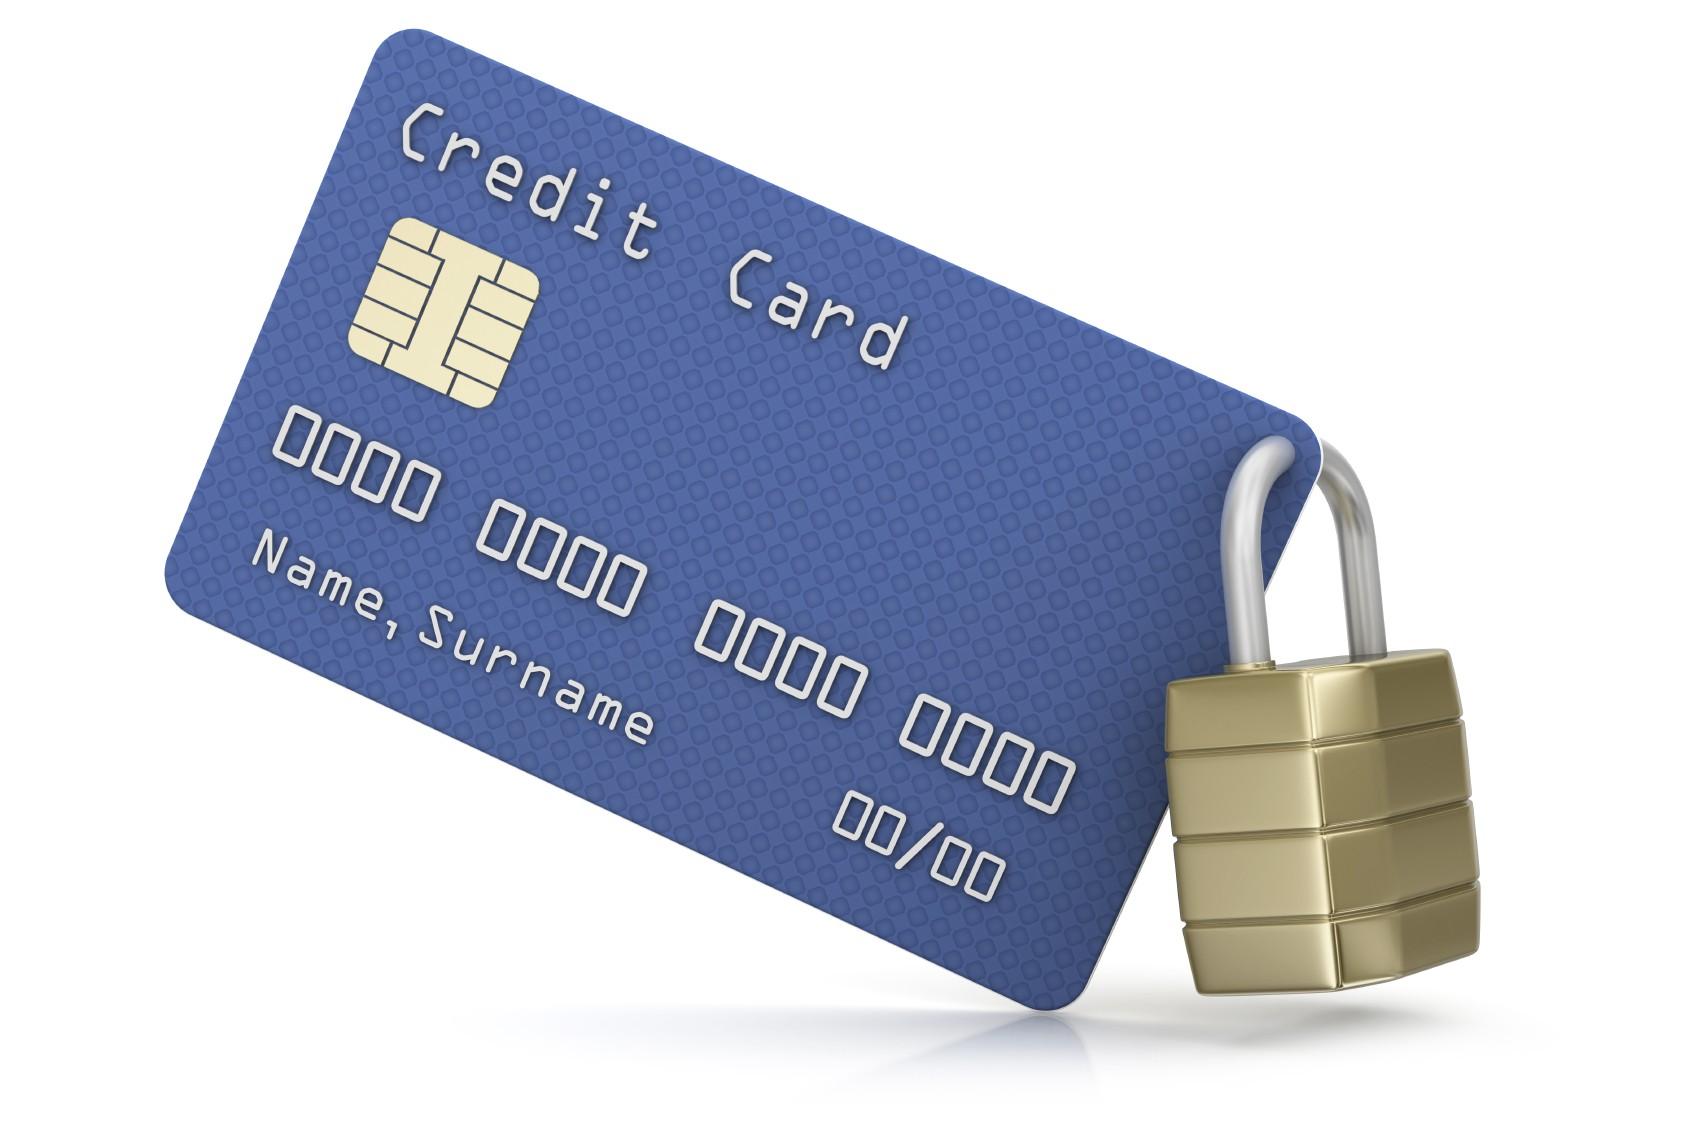 mogut-li-pristavy-arestovat-kreditnuyu-kartu_15